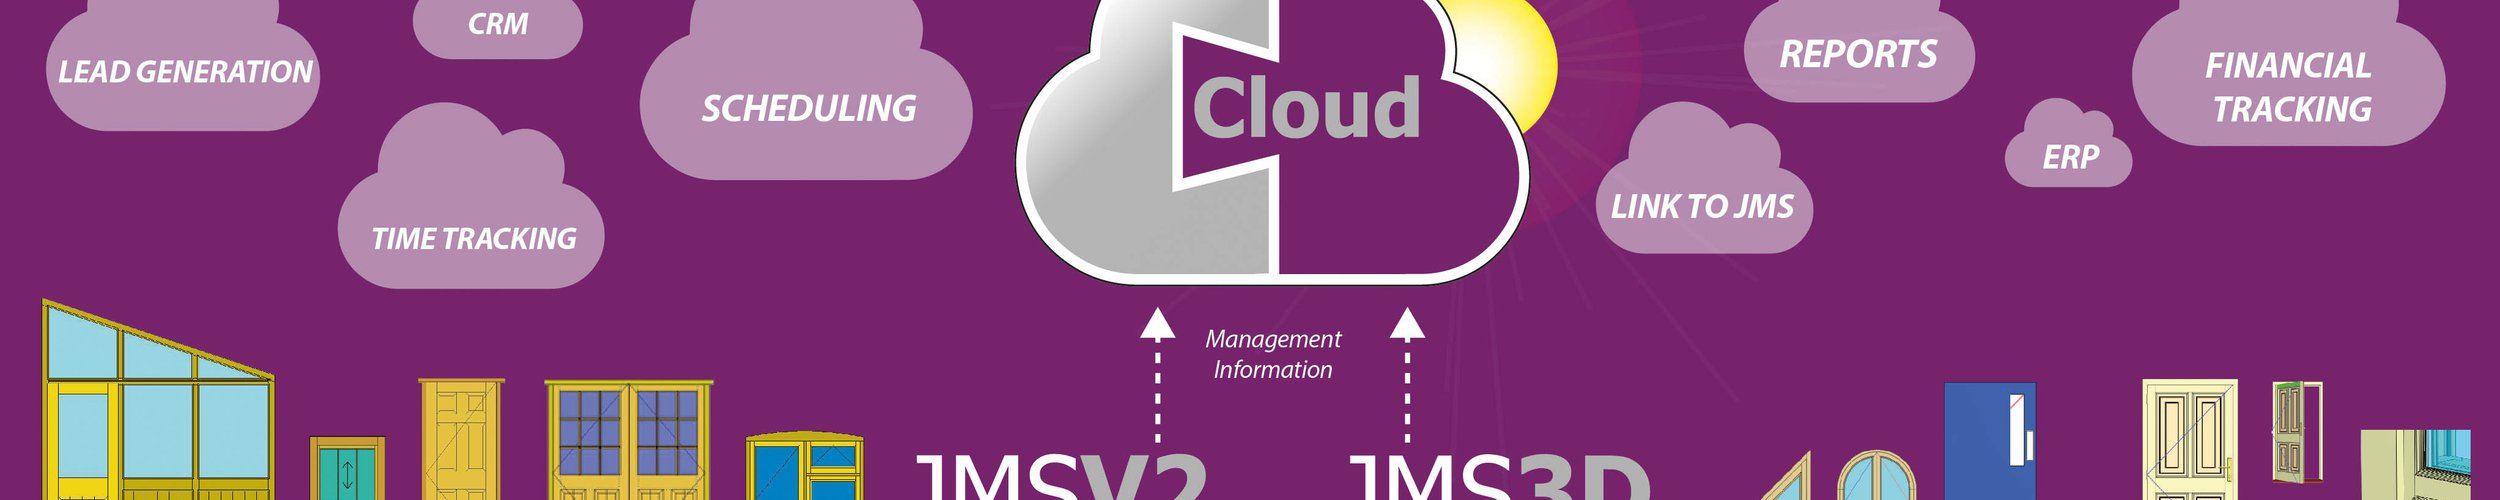 main_image_cloud.jpg